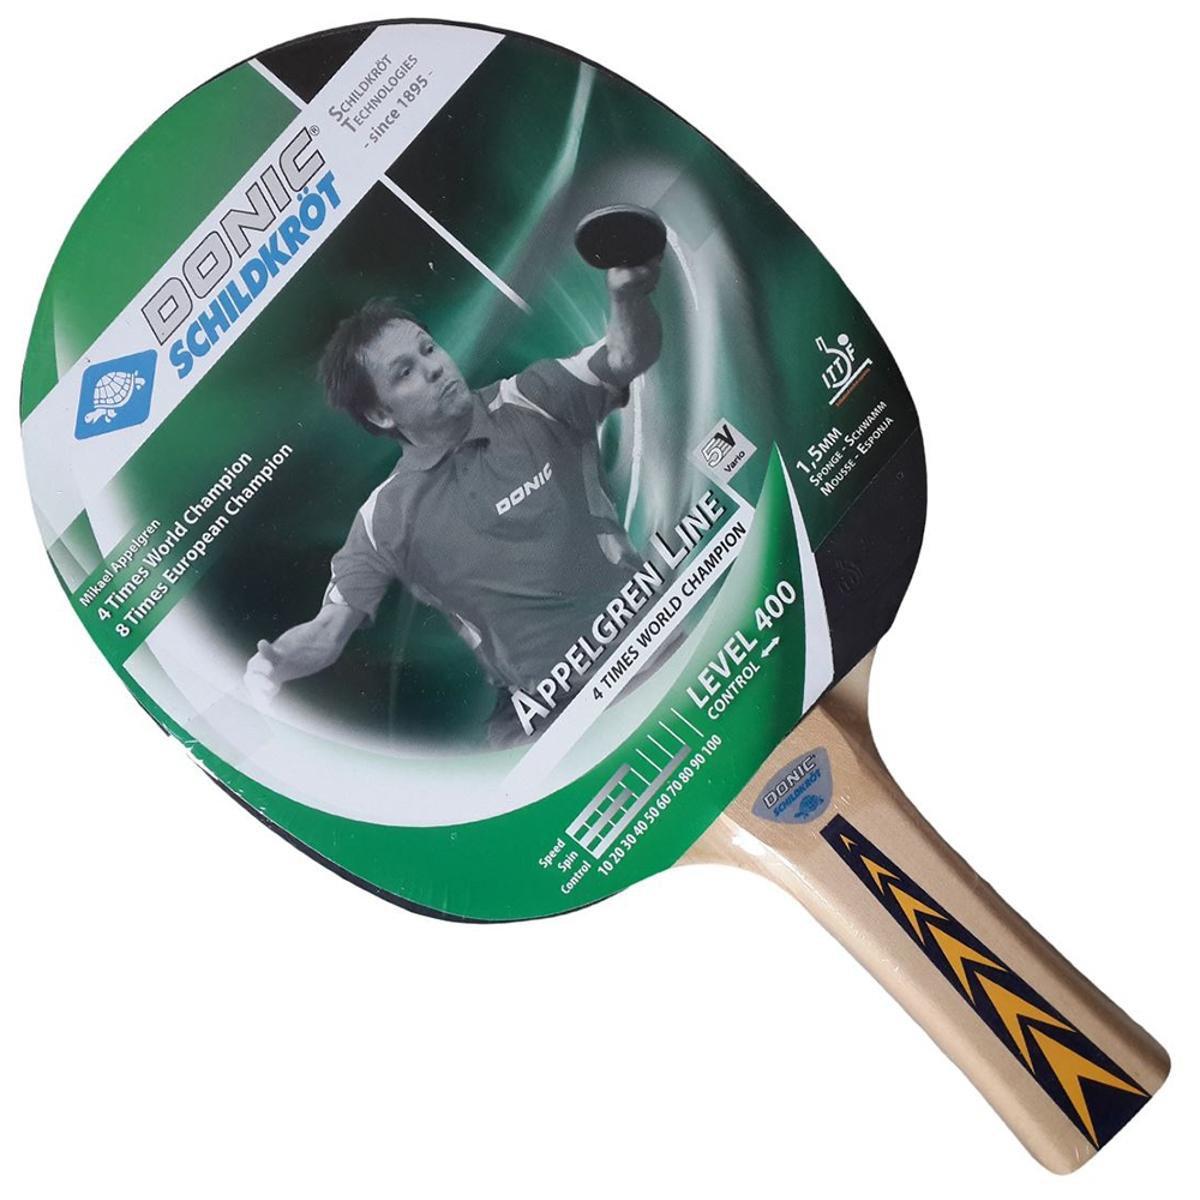 913463f9a Raquete de Tênis de Mesa Donic Appelgren 400 - Compre Agora